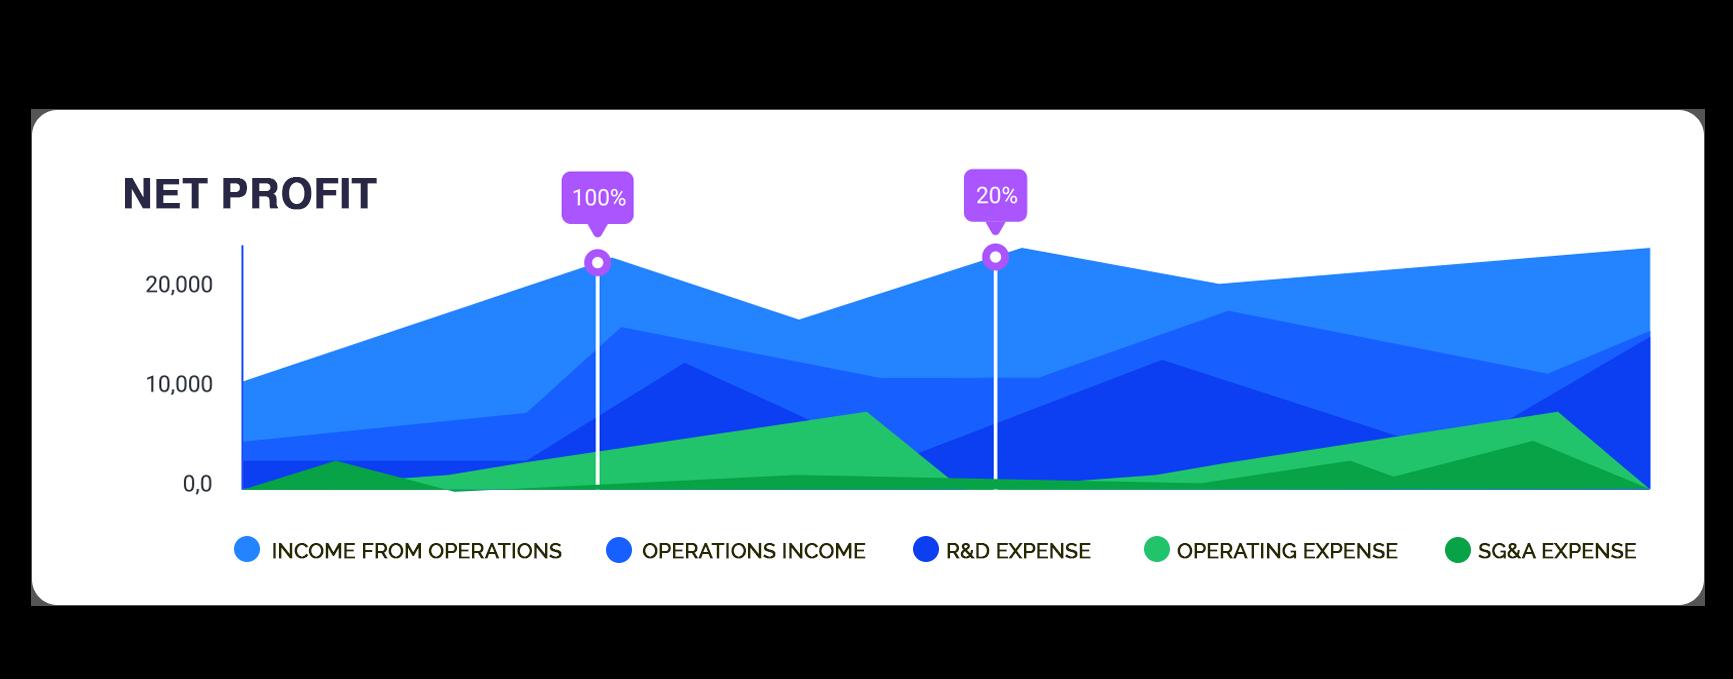 CEO Dashboard - Area Chart